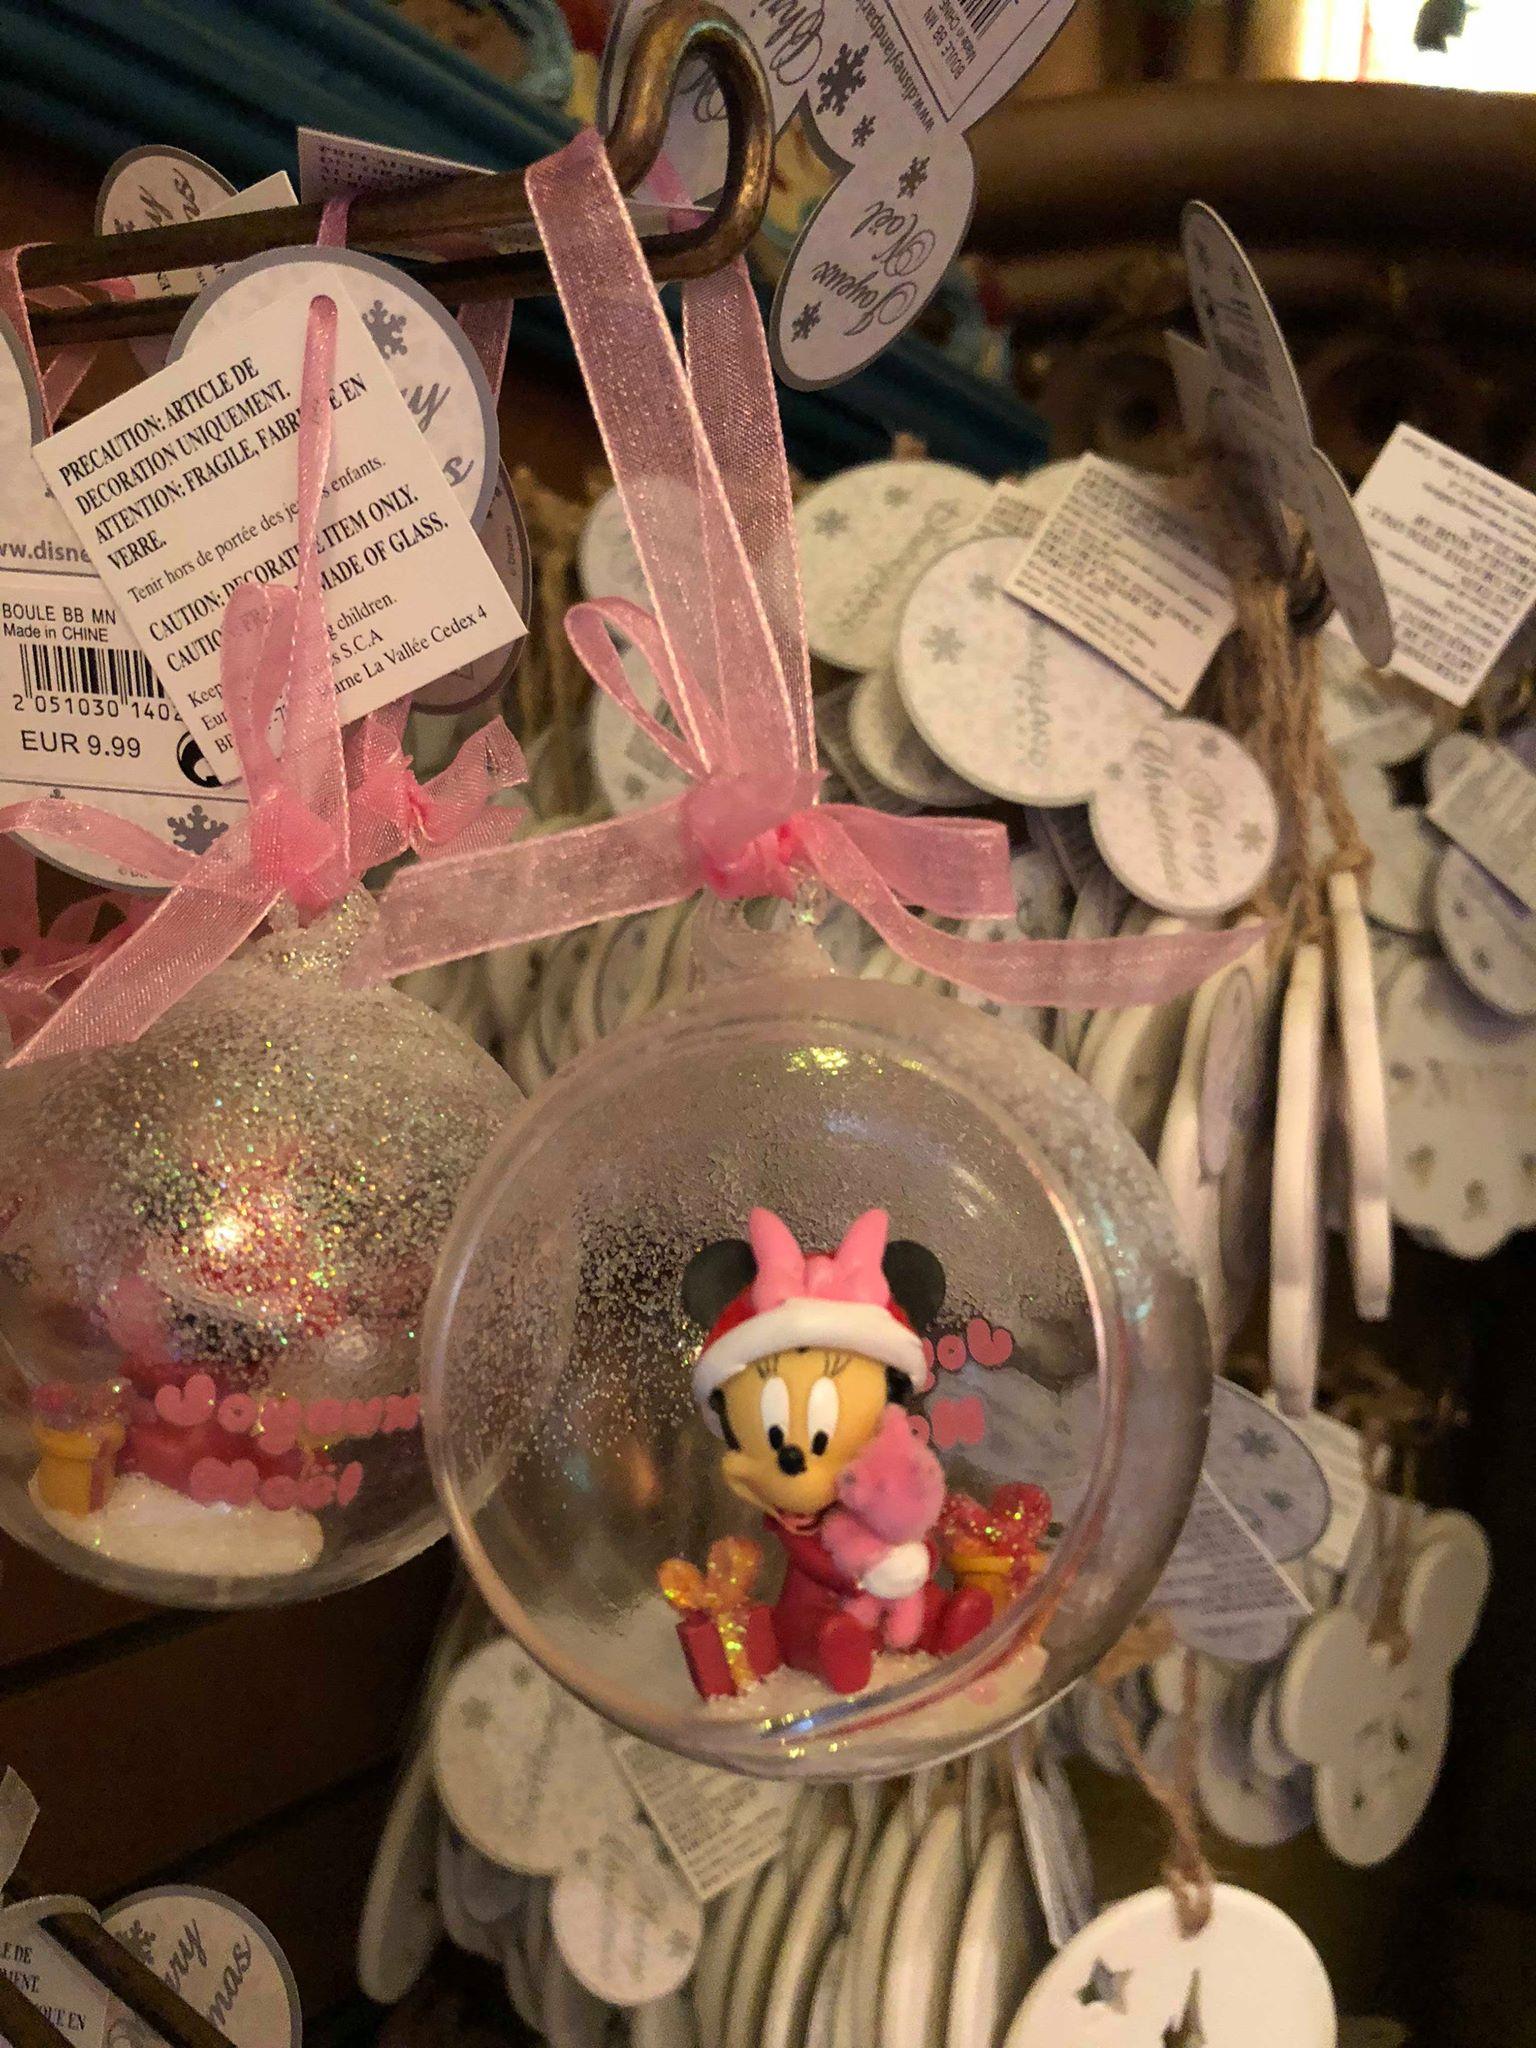 boule noel disney 2018 Le Noël Enchanté Disney 2018 : les informations !   Disneyland  boule noel disney 2018